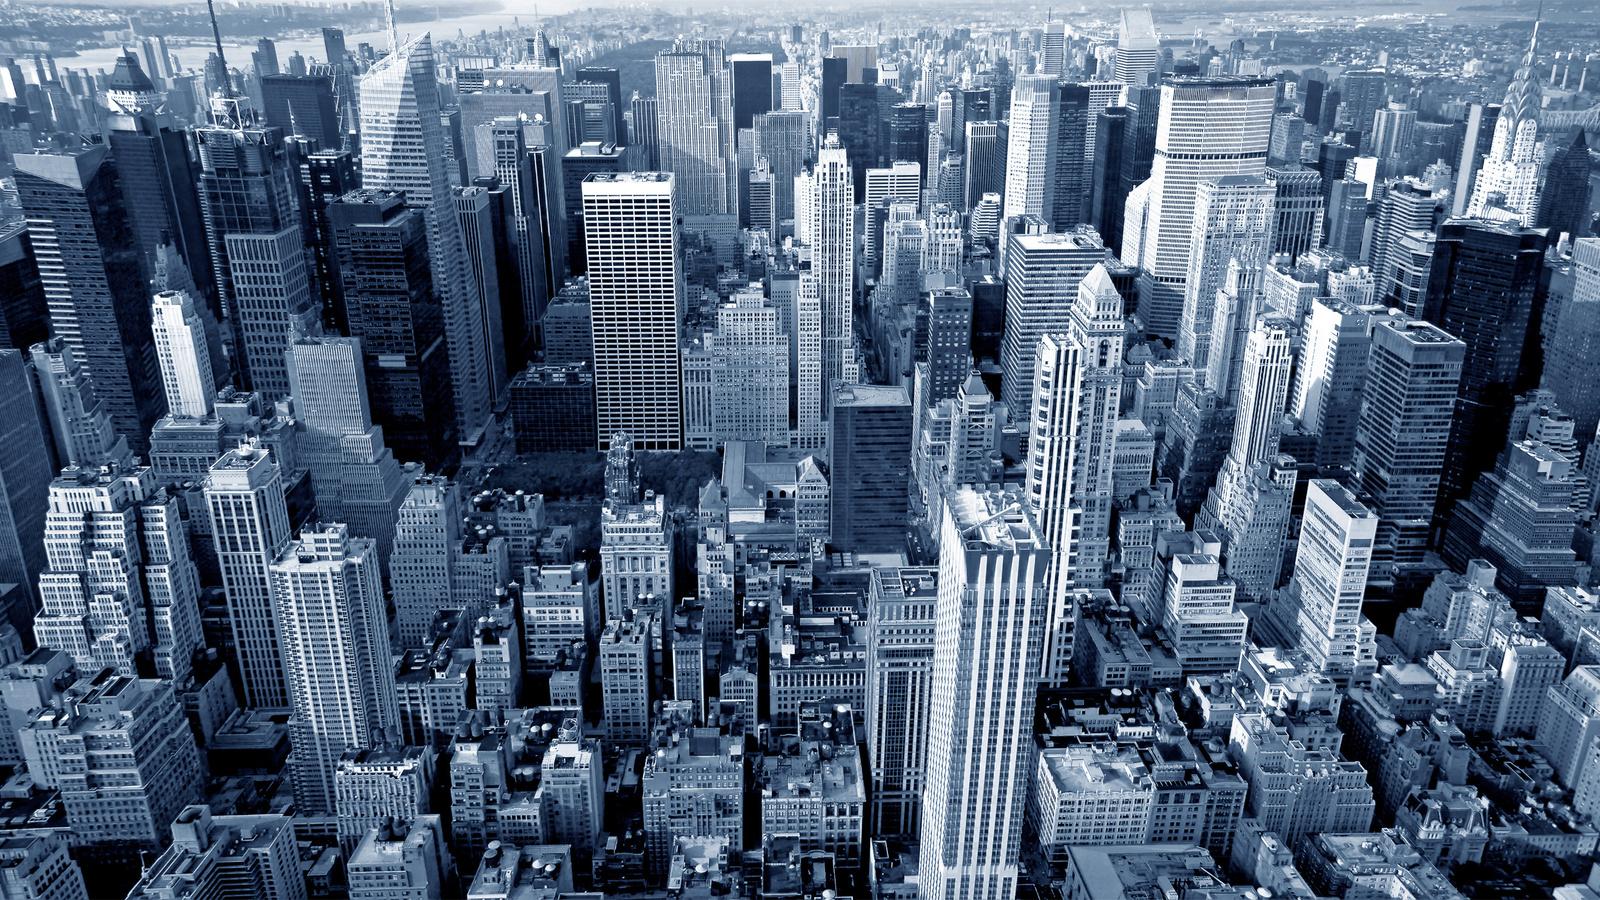 дома, небоскребы, нью-йорк, манхэттен, мегаполис, город, new york